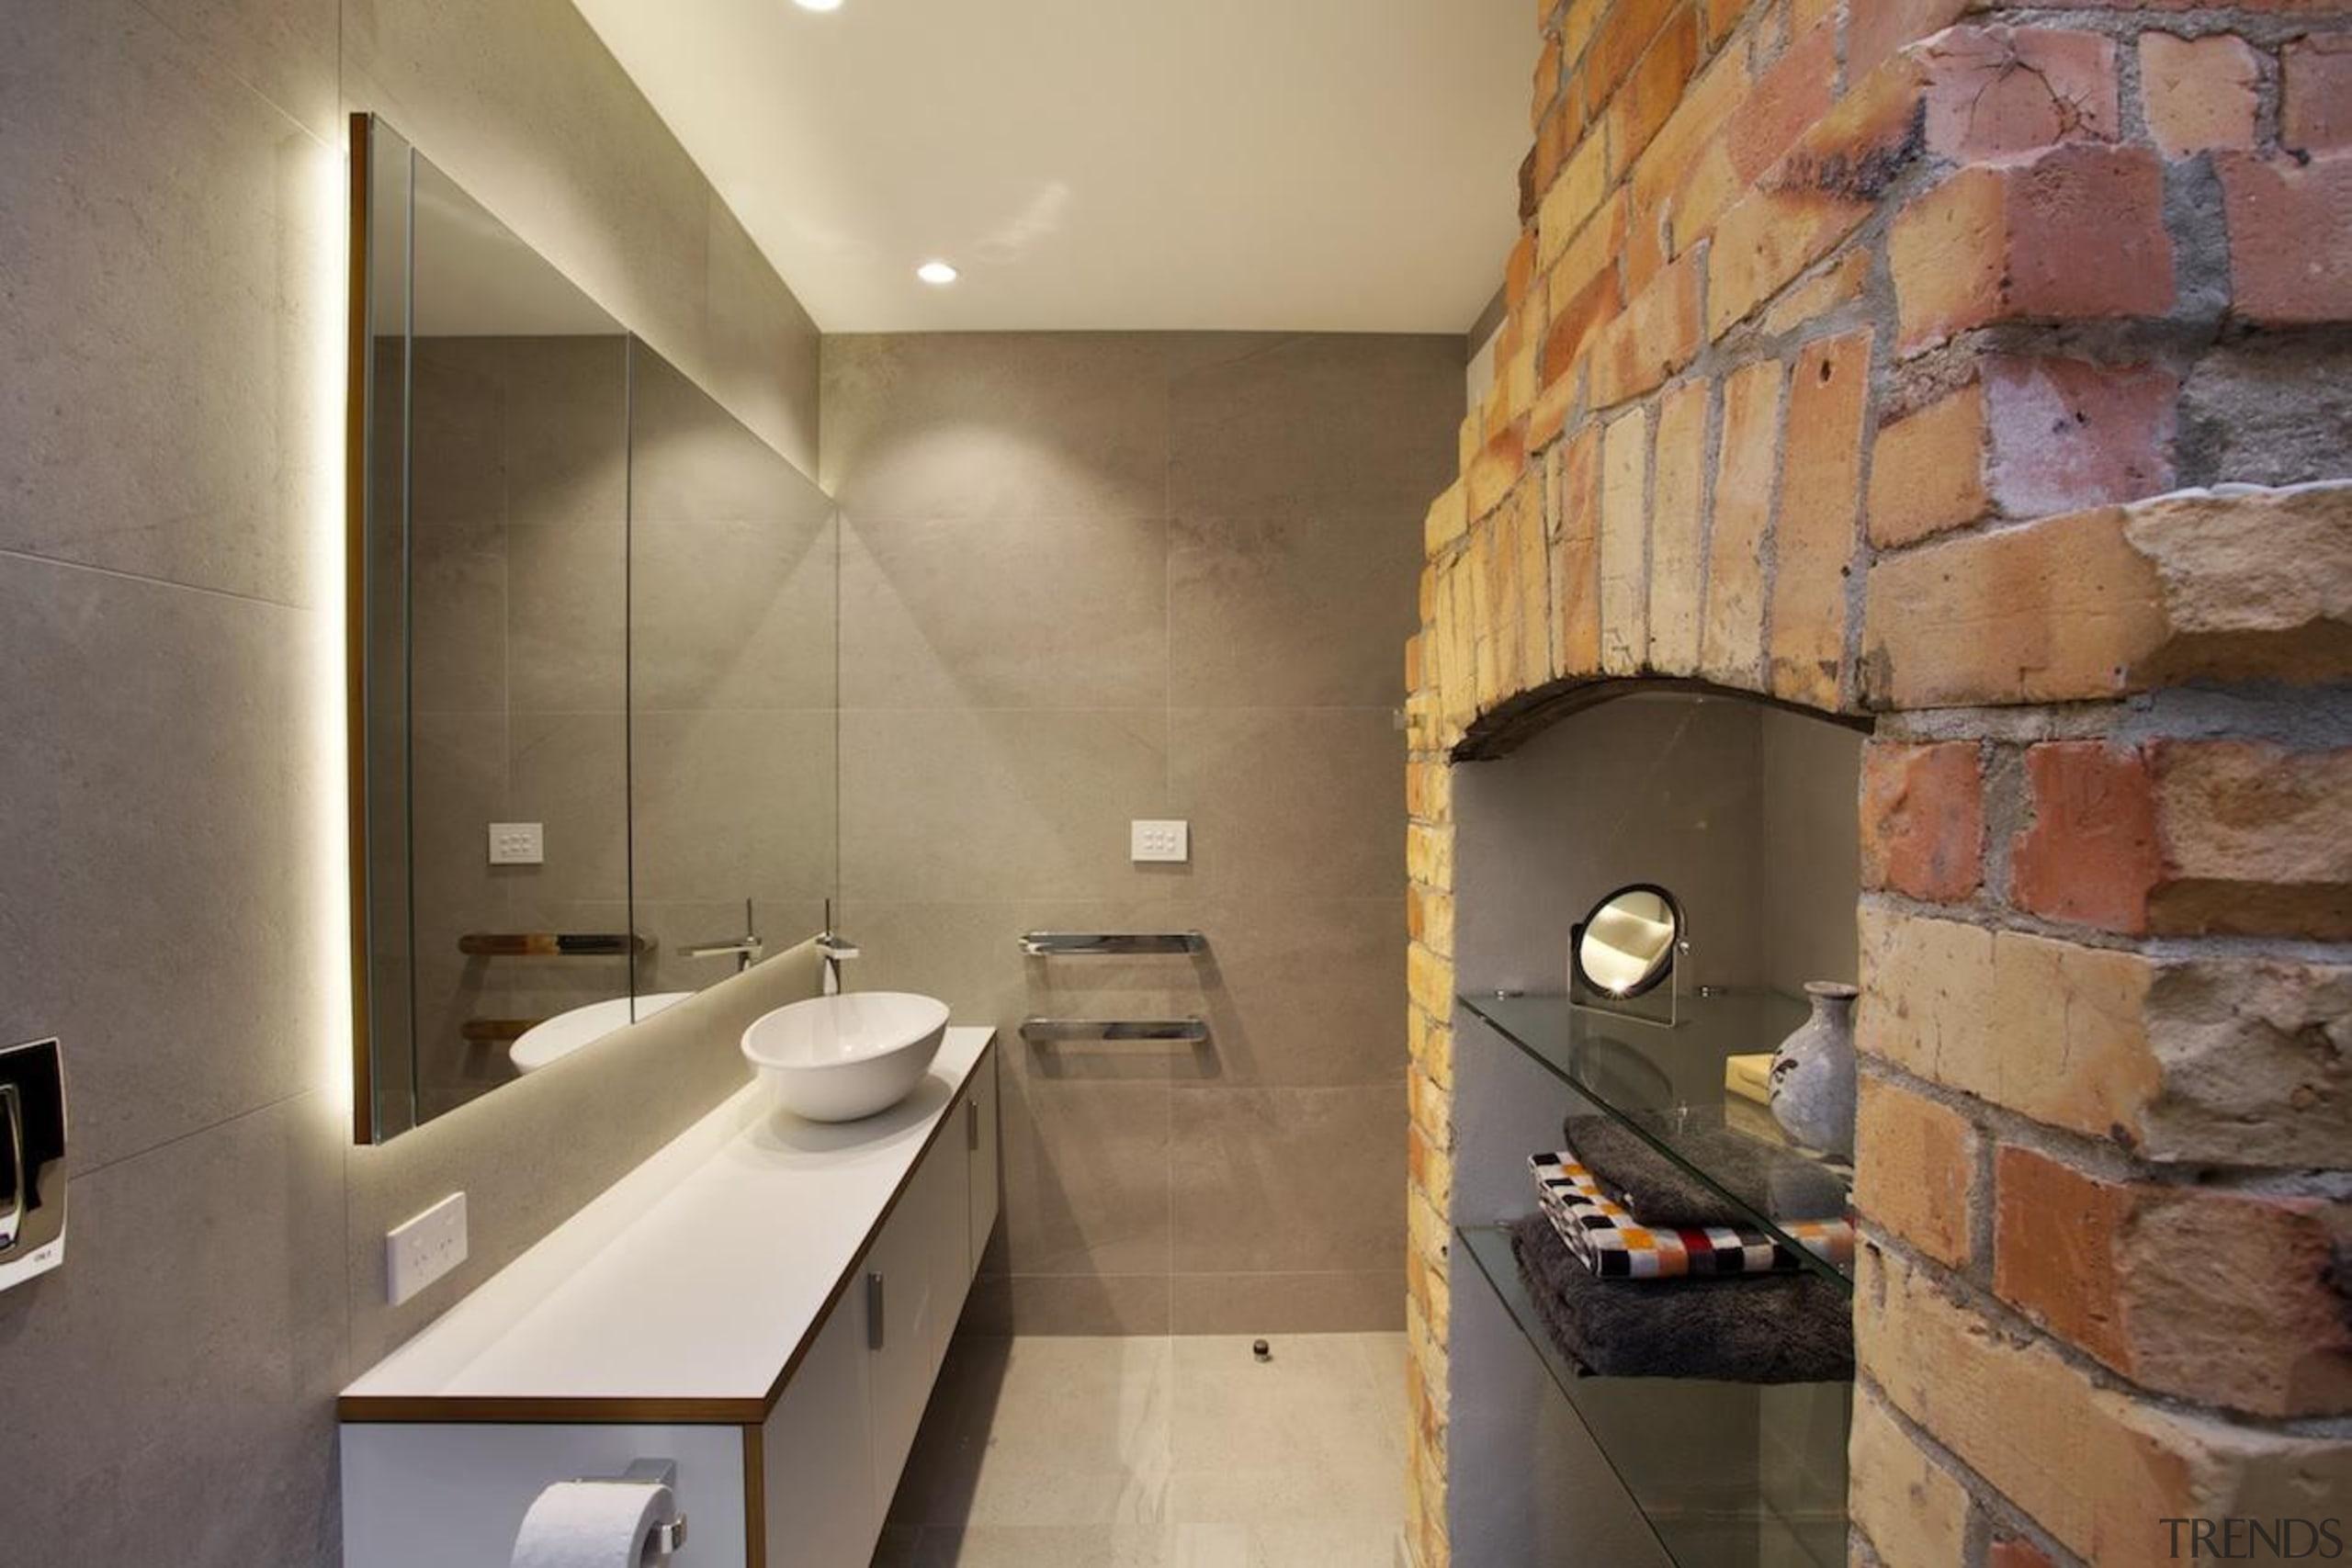 CAAHT Studio Architects –Master Suite Winner - 2015 bathroom, floor, interior design, room, tile, brown, orange